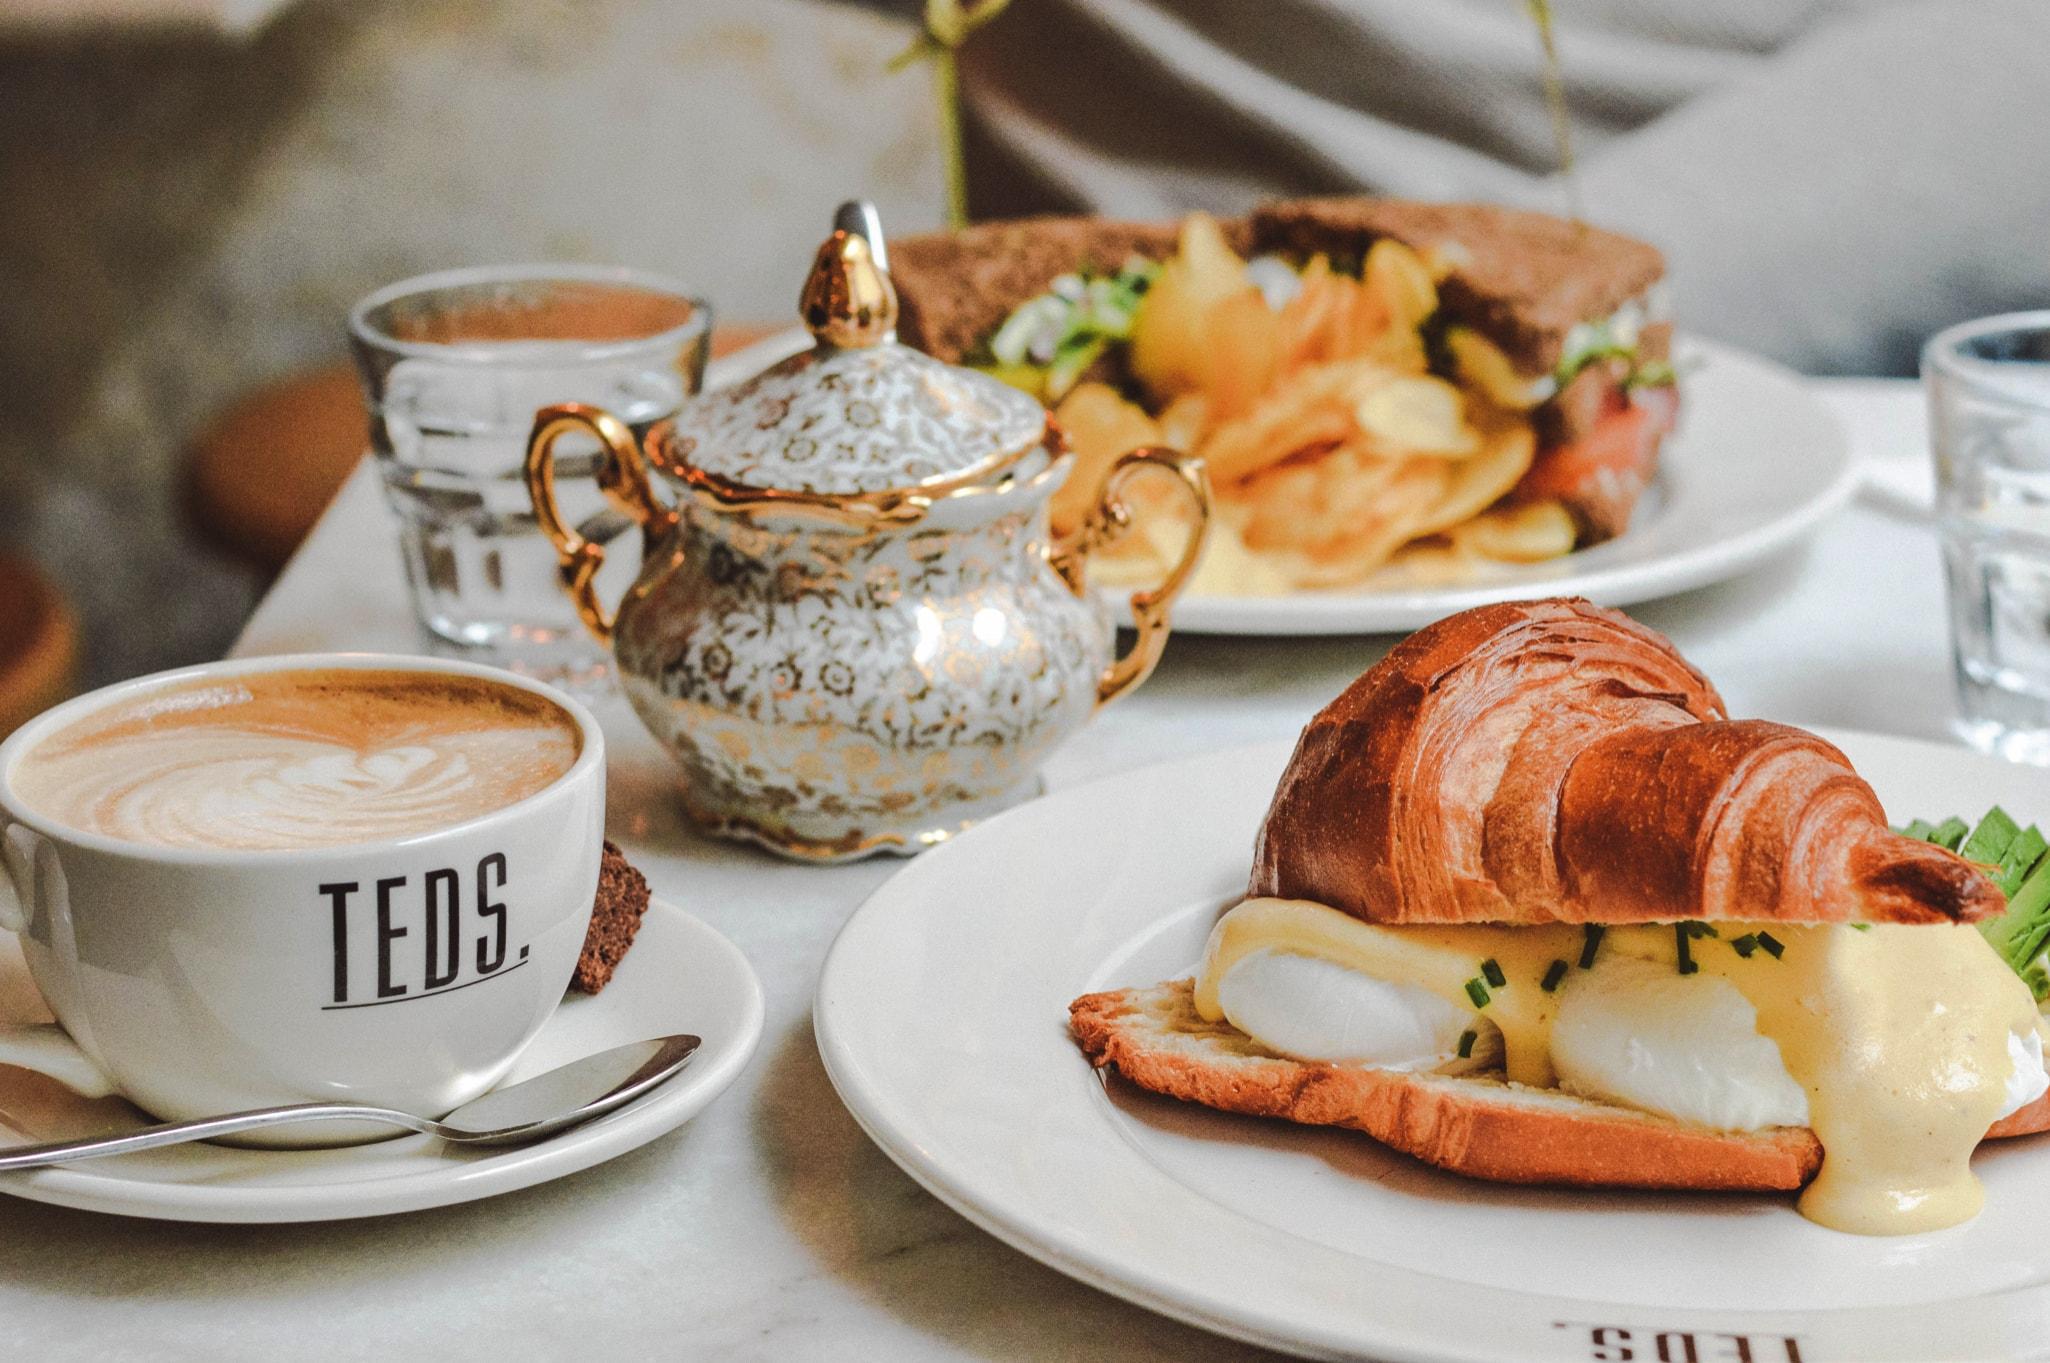 TEDS UTRECHT: ALL DAY EVERY DAY BRUNCH CAFÉ